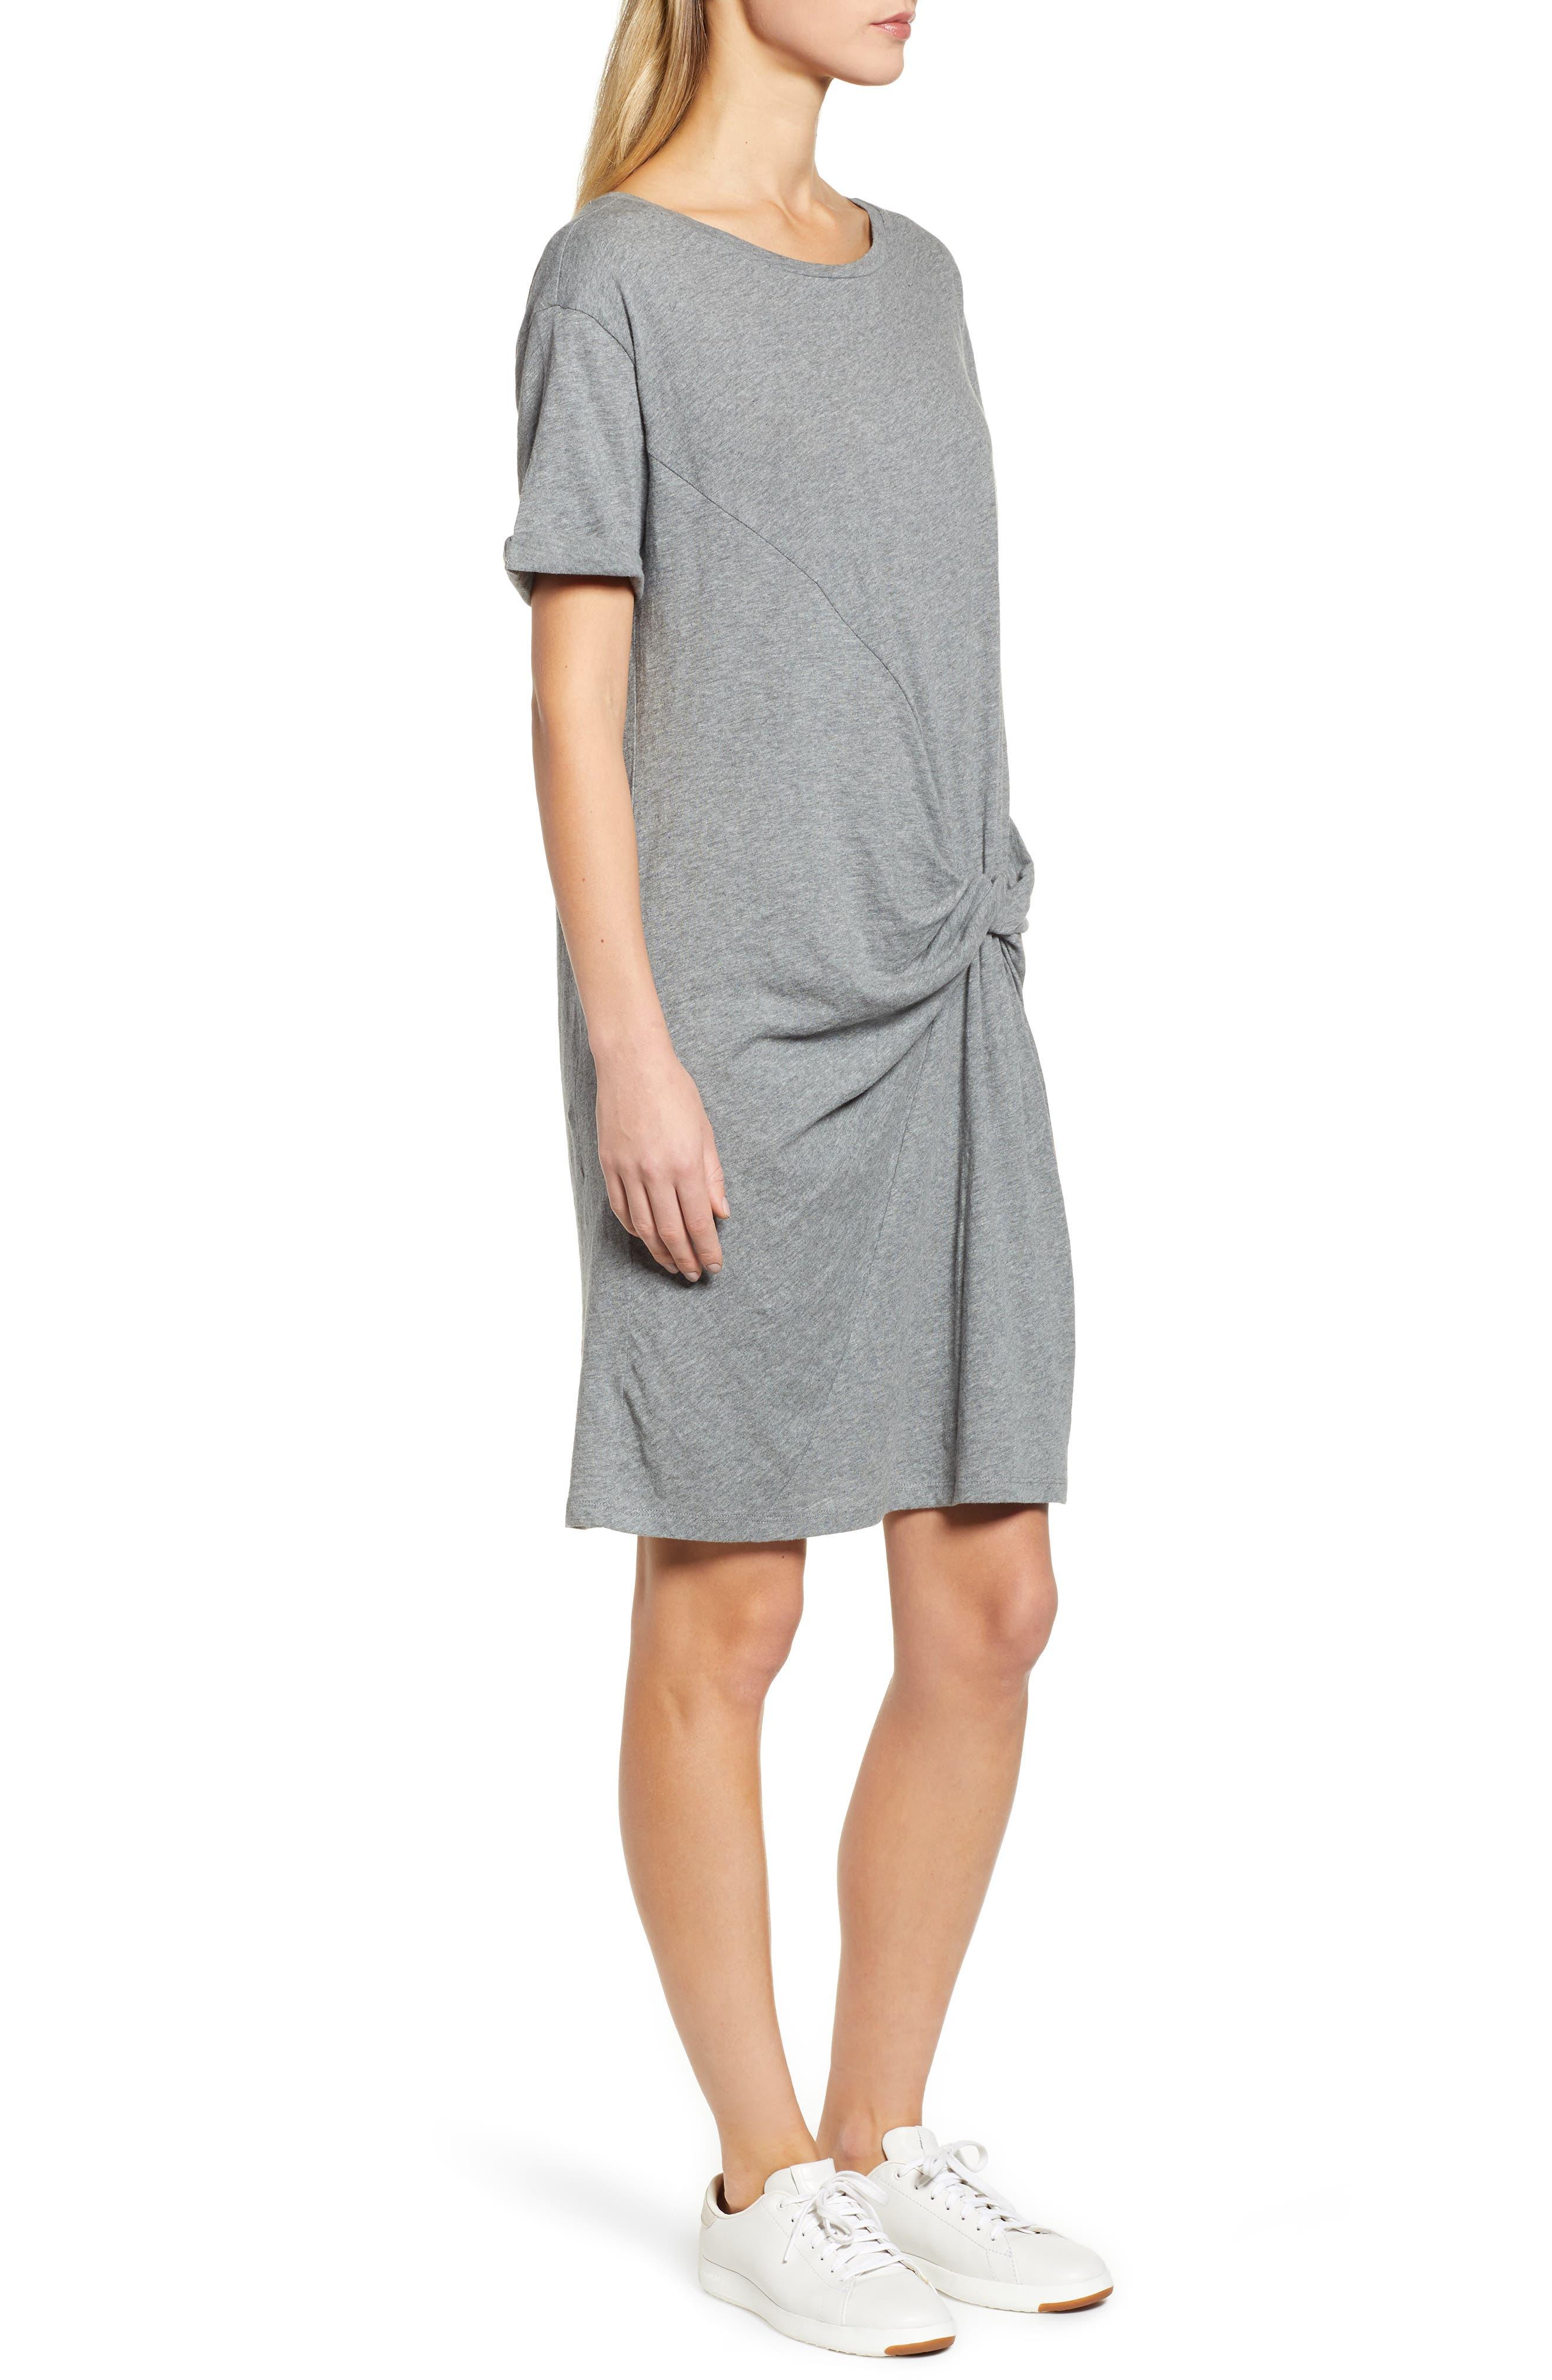 Knot Front T-Shirt Dress,                             Alternate thumbnail 3, color,                             GREY DARK HEATHER